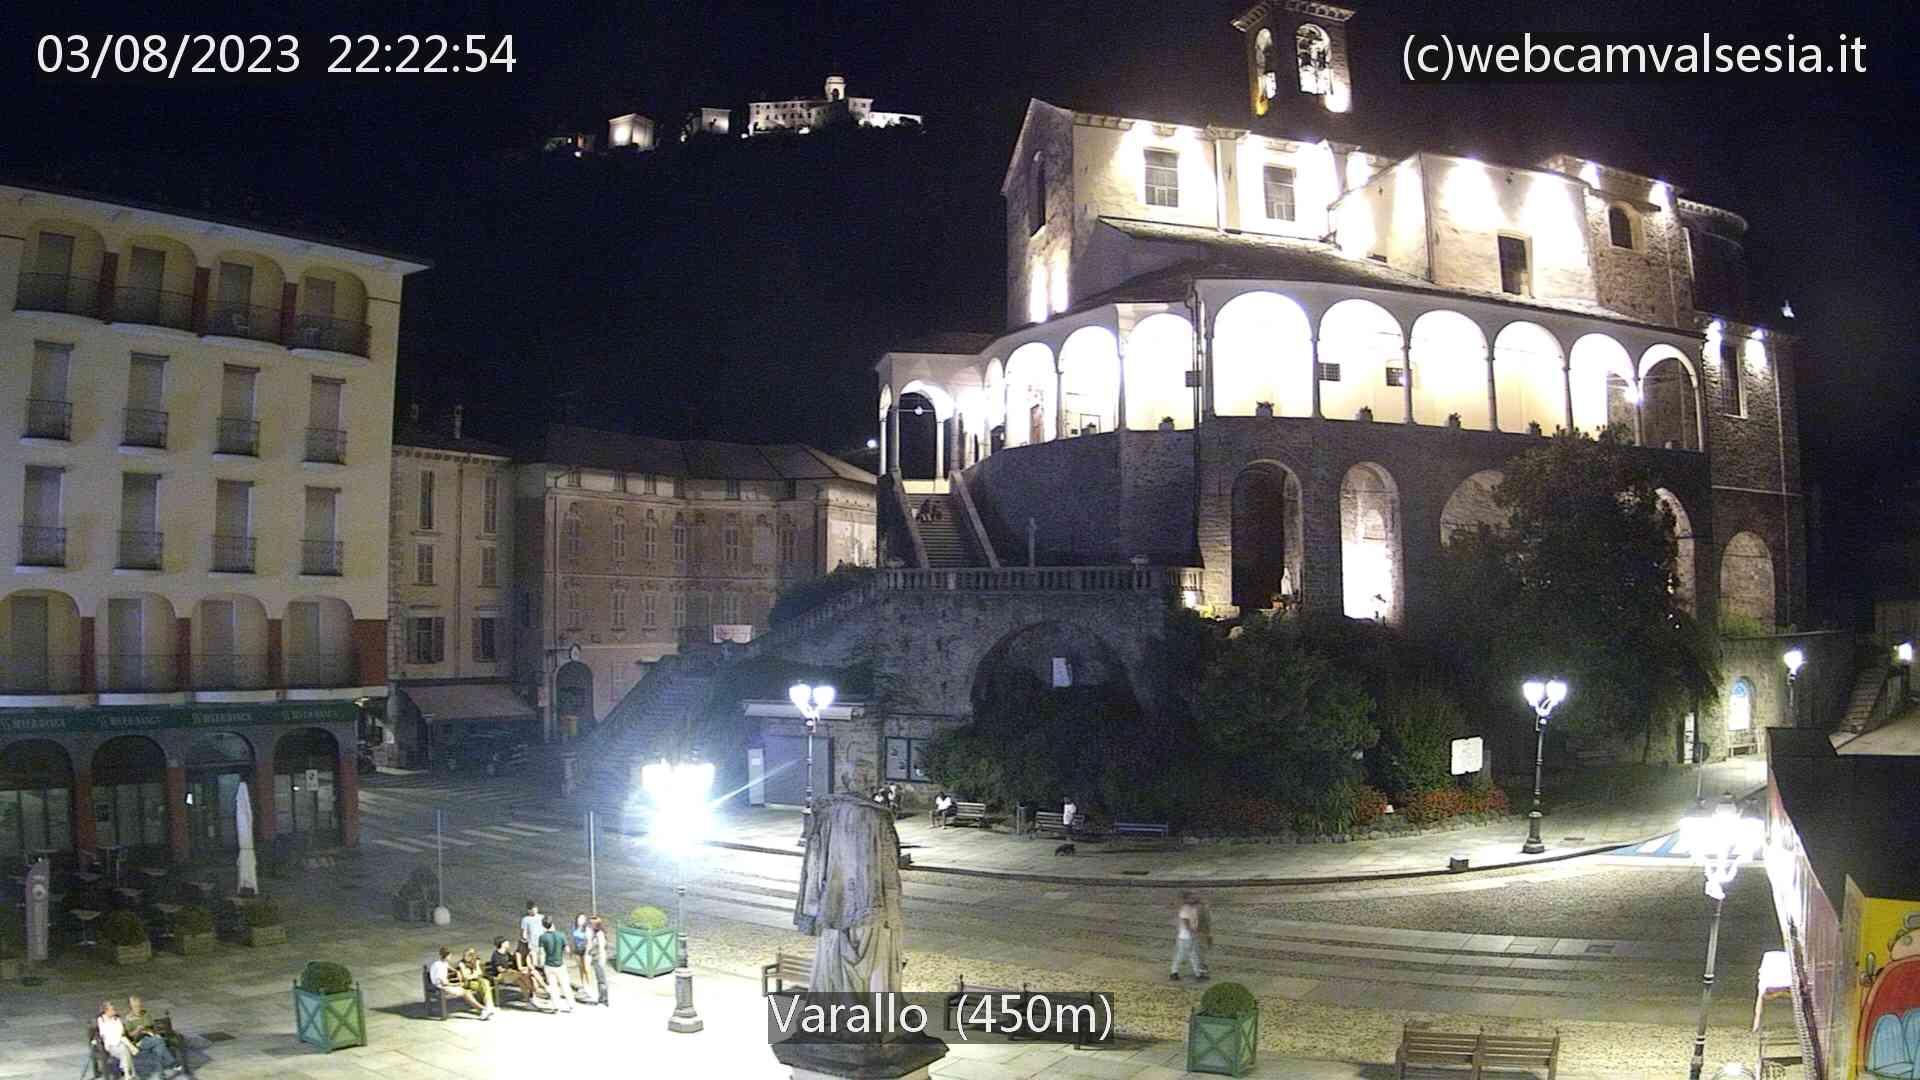 webcam valsesia Varallo 2